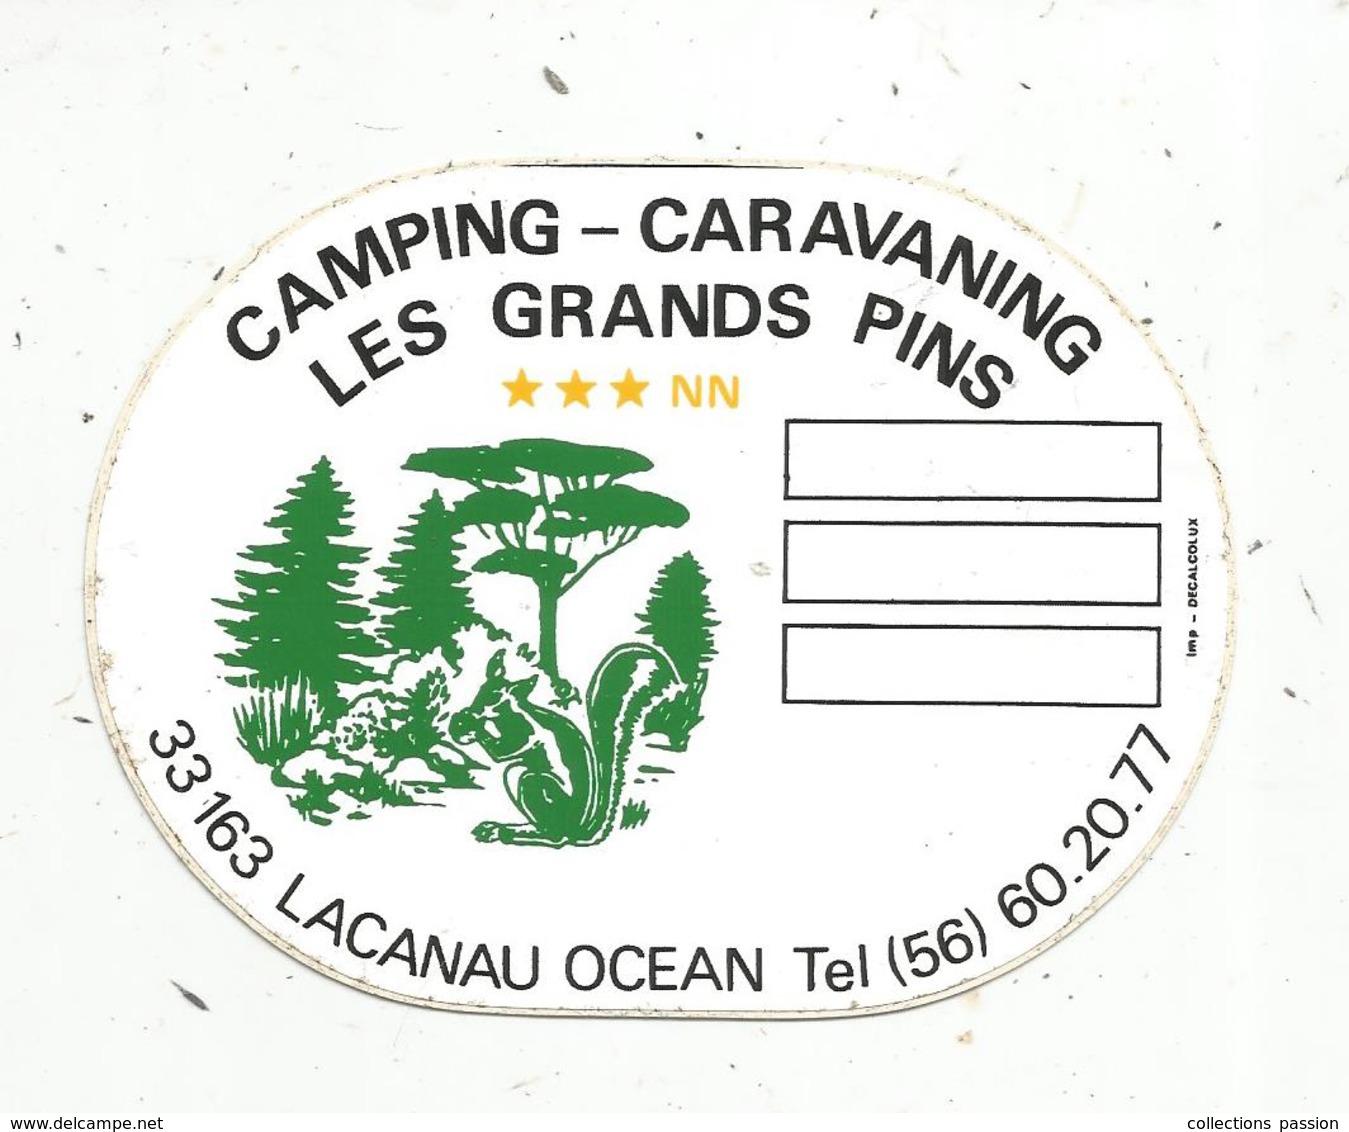 Autocollant , CAMPING - CARAVANING ,  LES GRANDS PINS ,33, LACANAU OCEAN - Autocollants